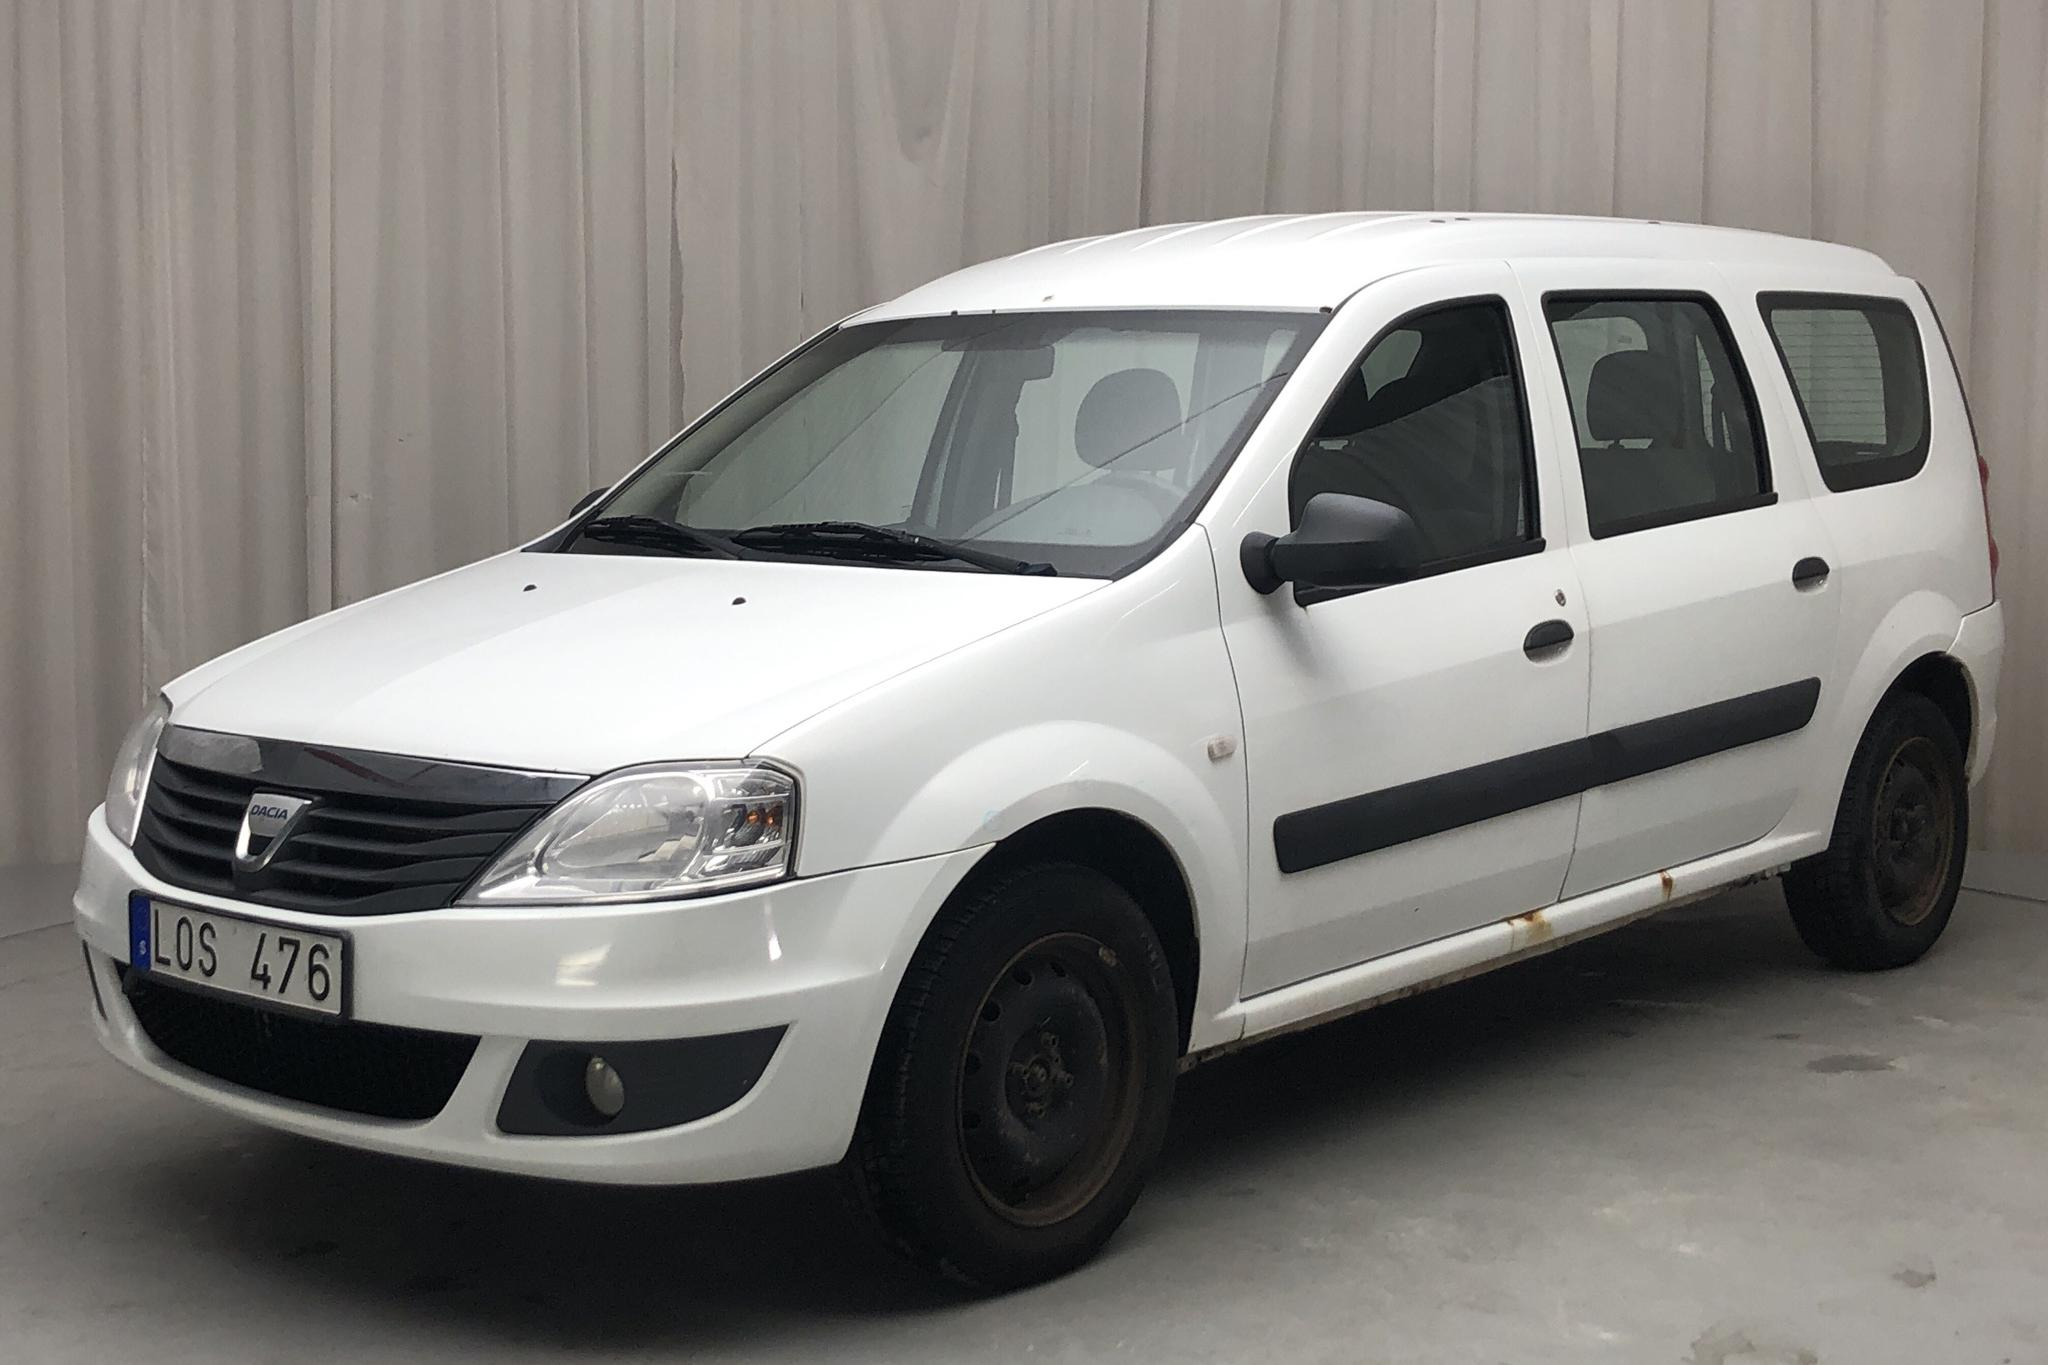 Dacia Logan MCV 1.6 E85 Hi-Flex (105hk) - 307 160 km - Manual - white - 2011